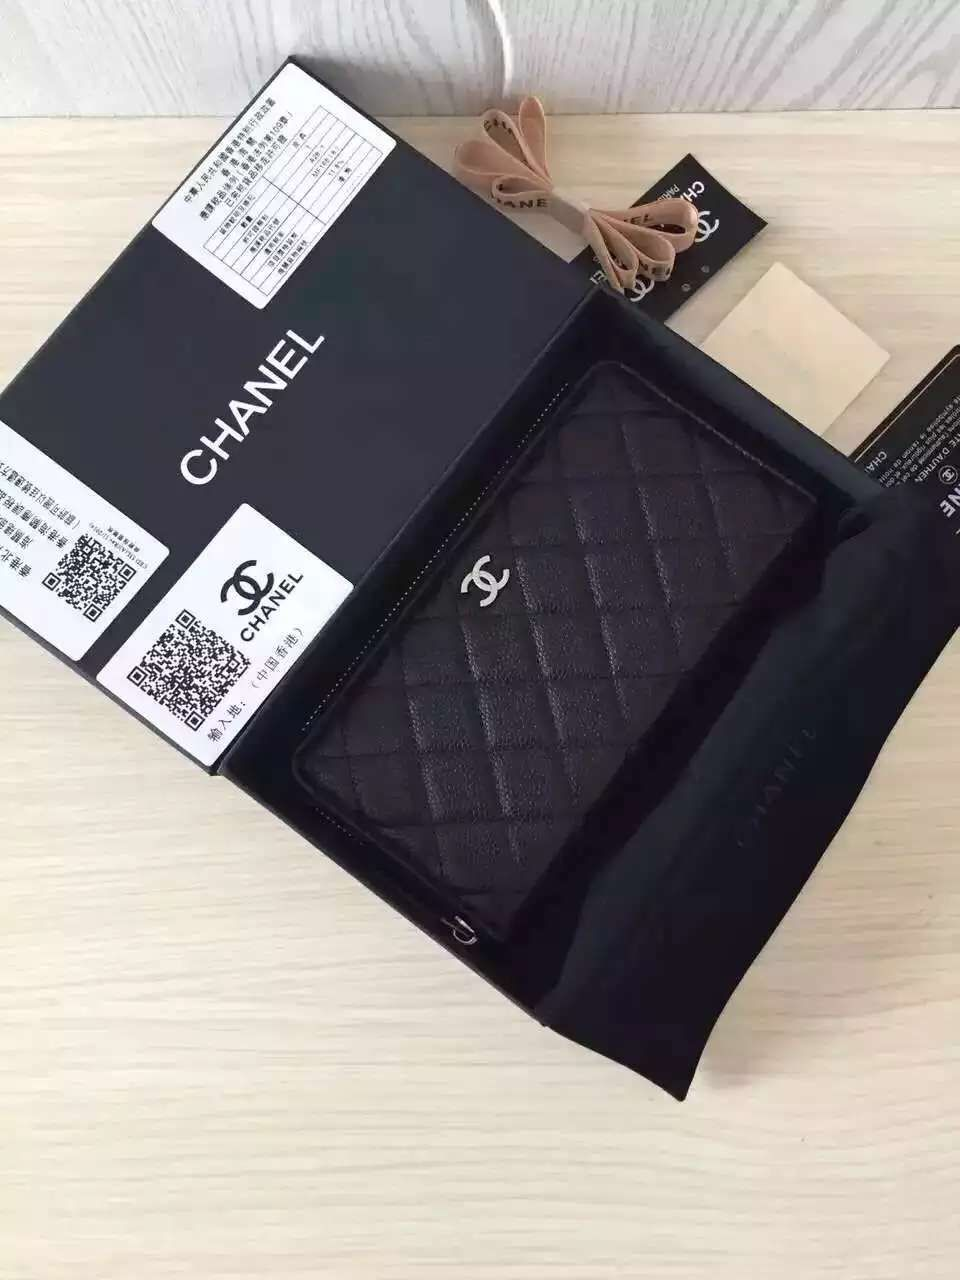 chanel Wallet 972aee1b2